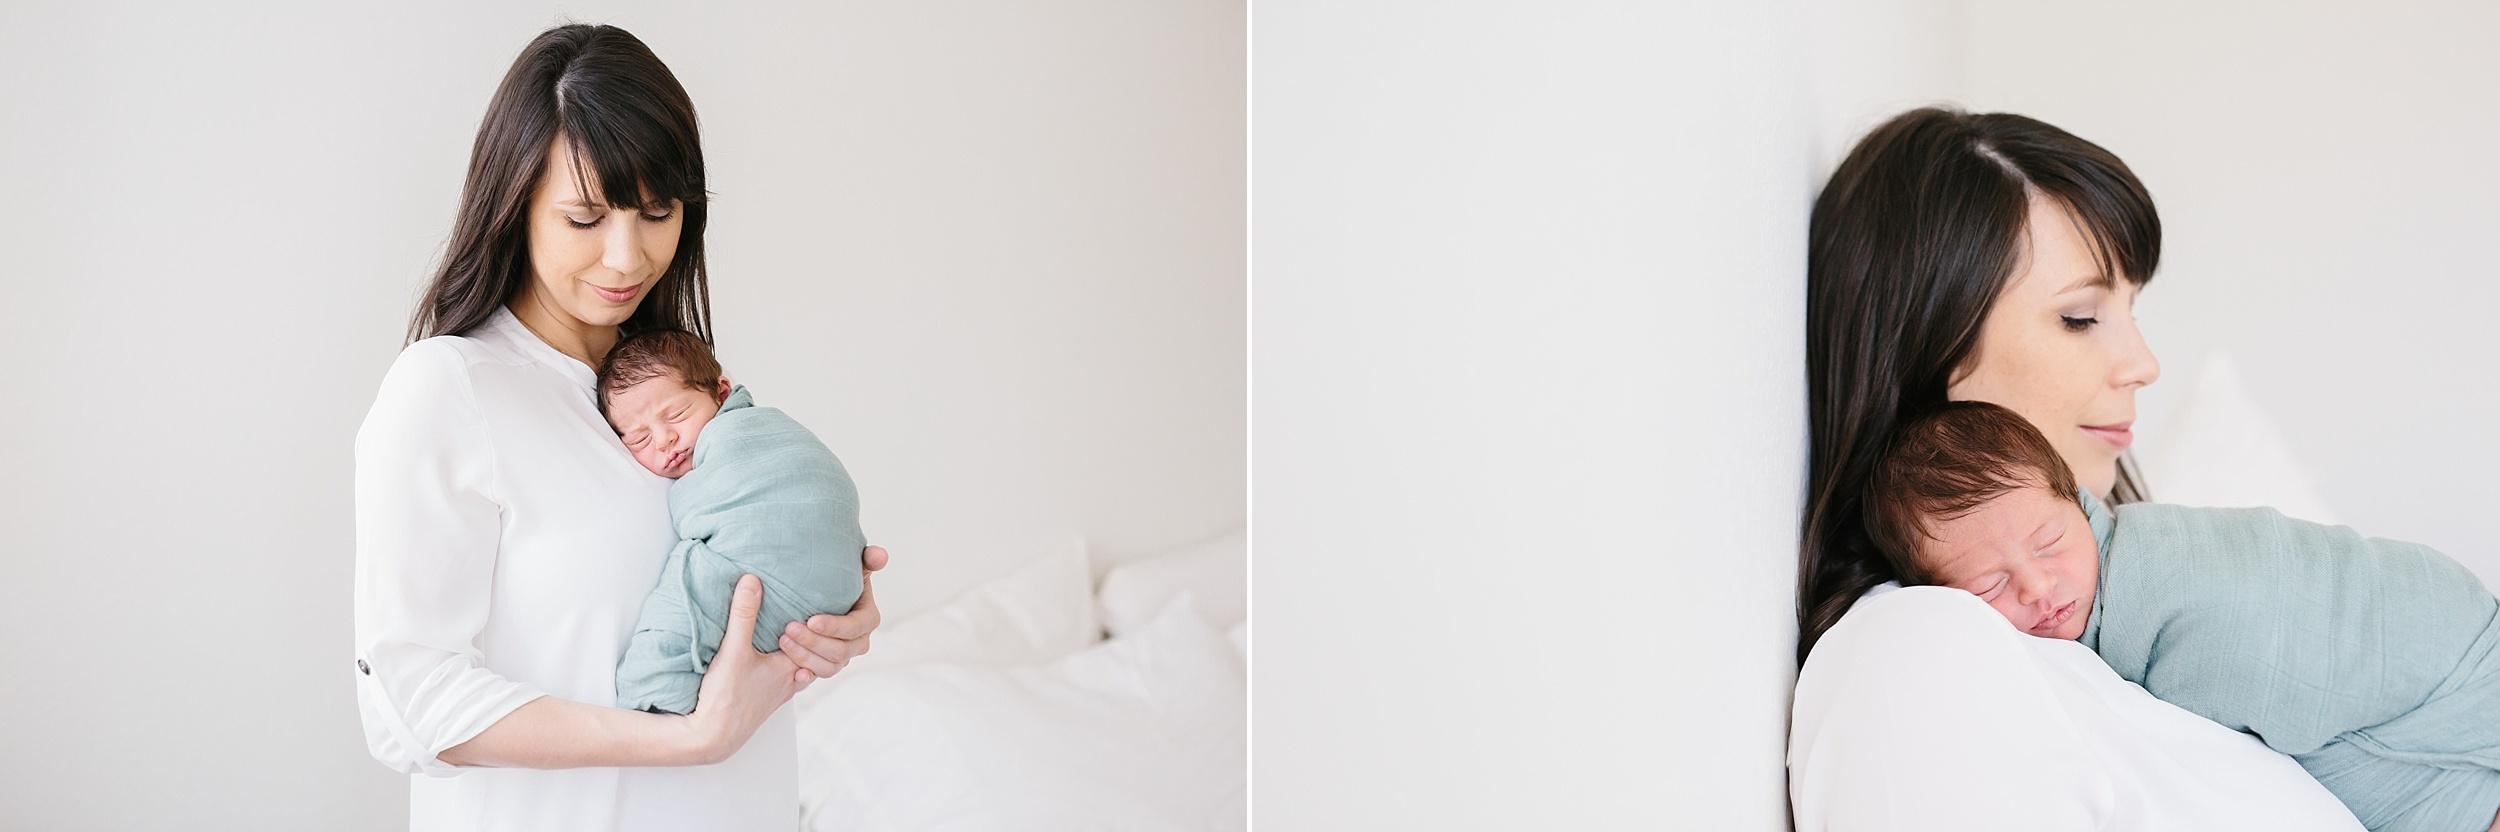 Austin TX Newborn Photography22.jpg